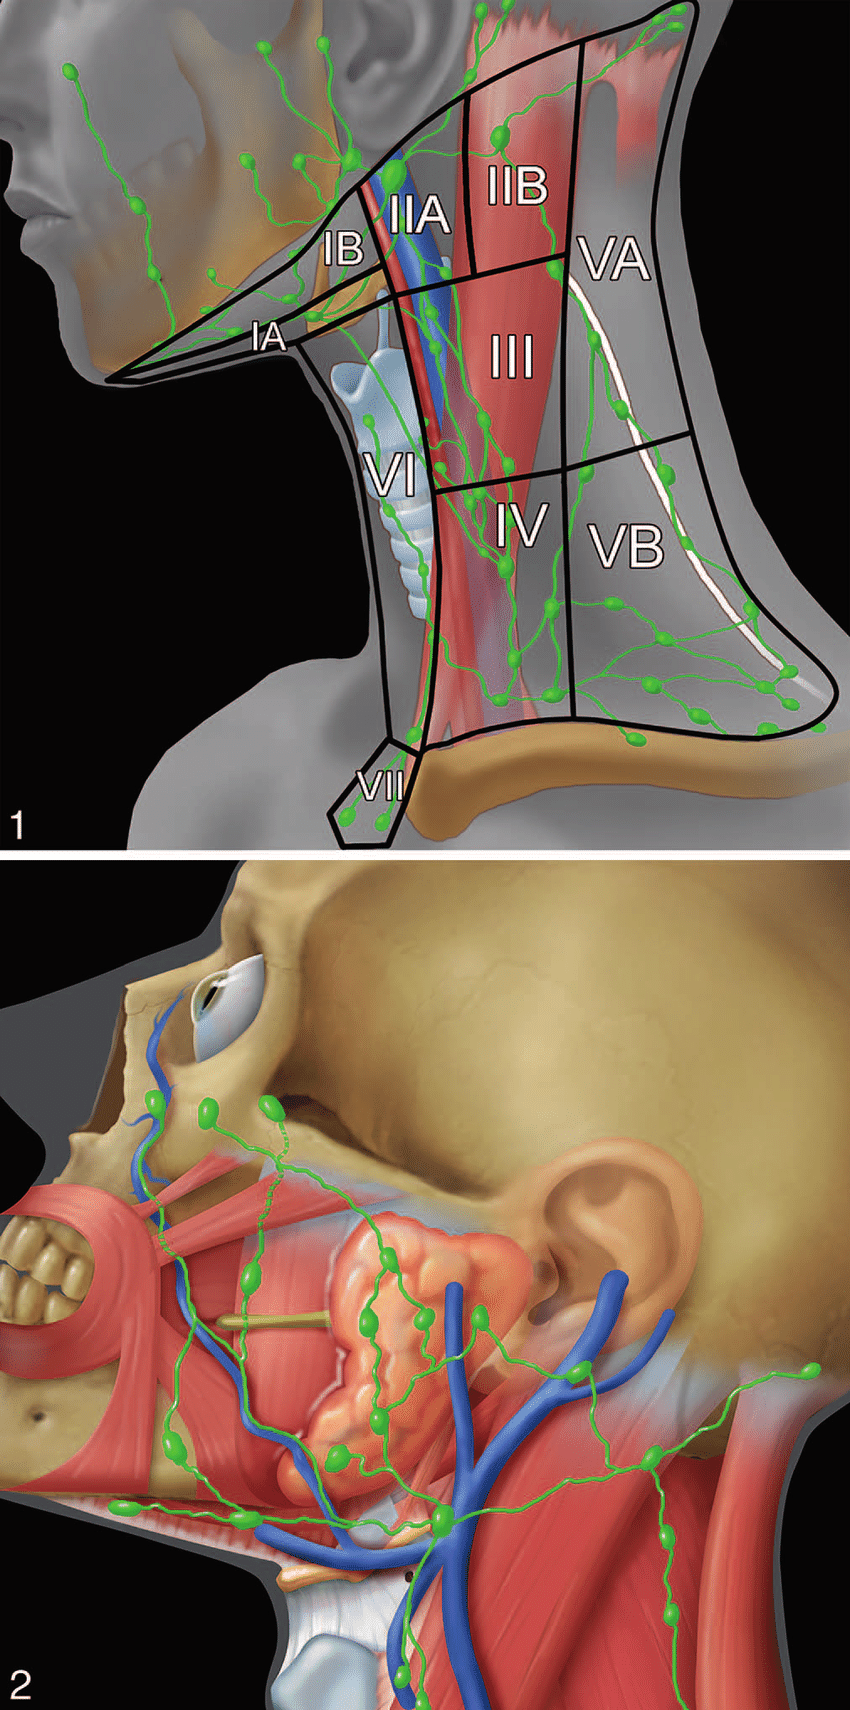 medium resolution of head and neck lymph node groups of the facial area including the parotid buccofacial